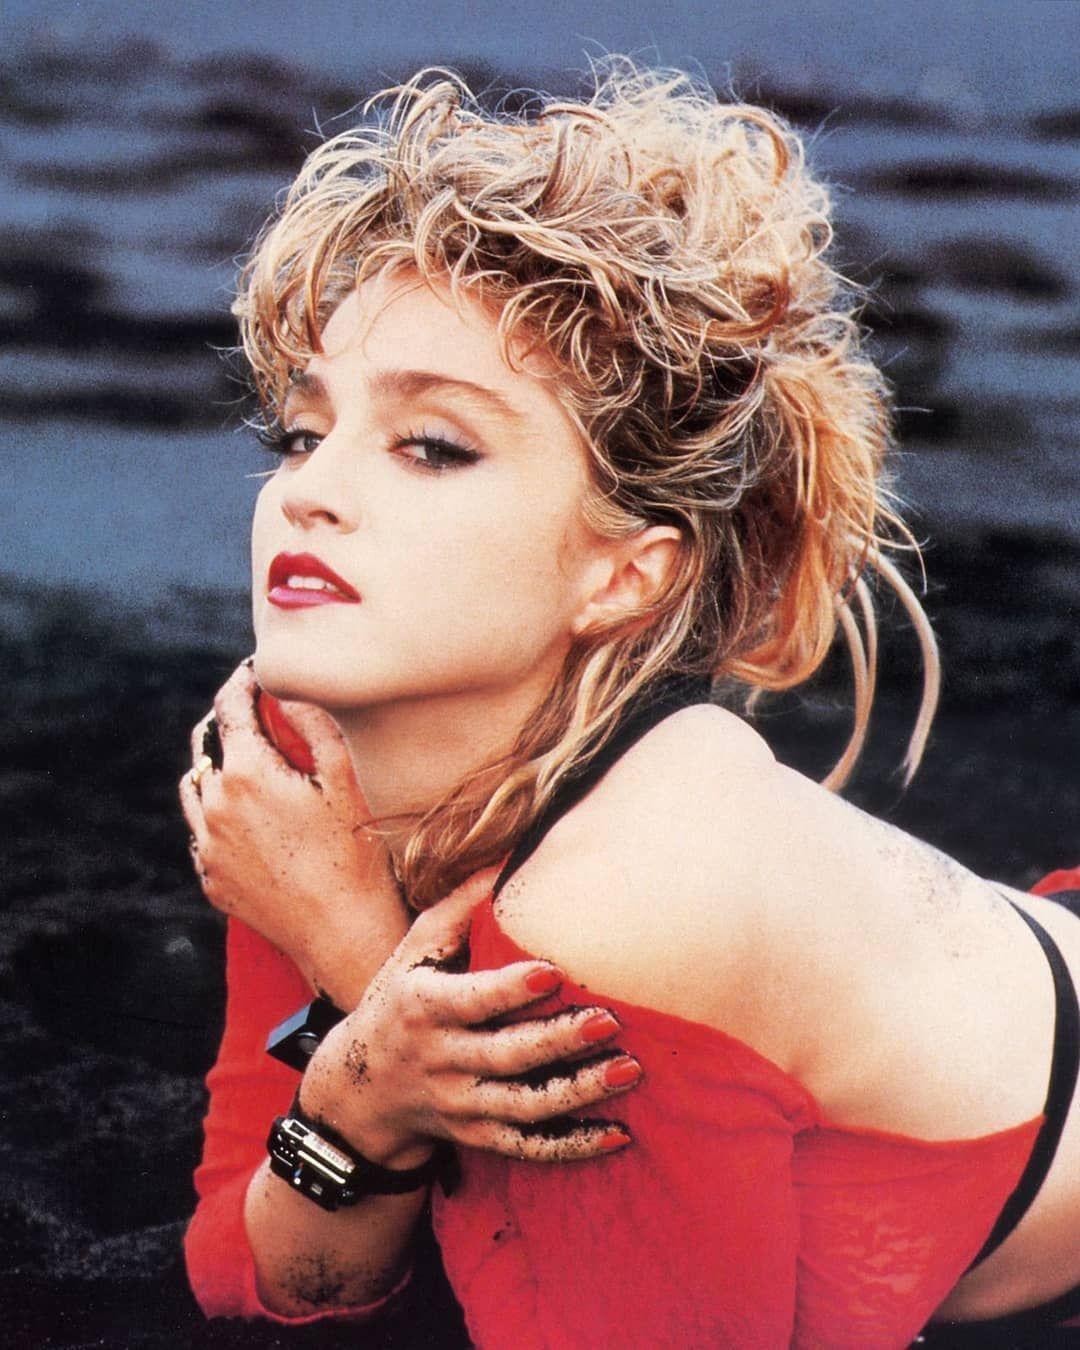 Madonna80s On Instagram Love Instagood Fashion Beauty Music Blonde Blueeyes Blondehair 80s American Madonna Madonna 80s Madonna 80s Fashion